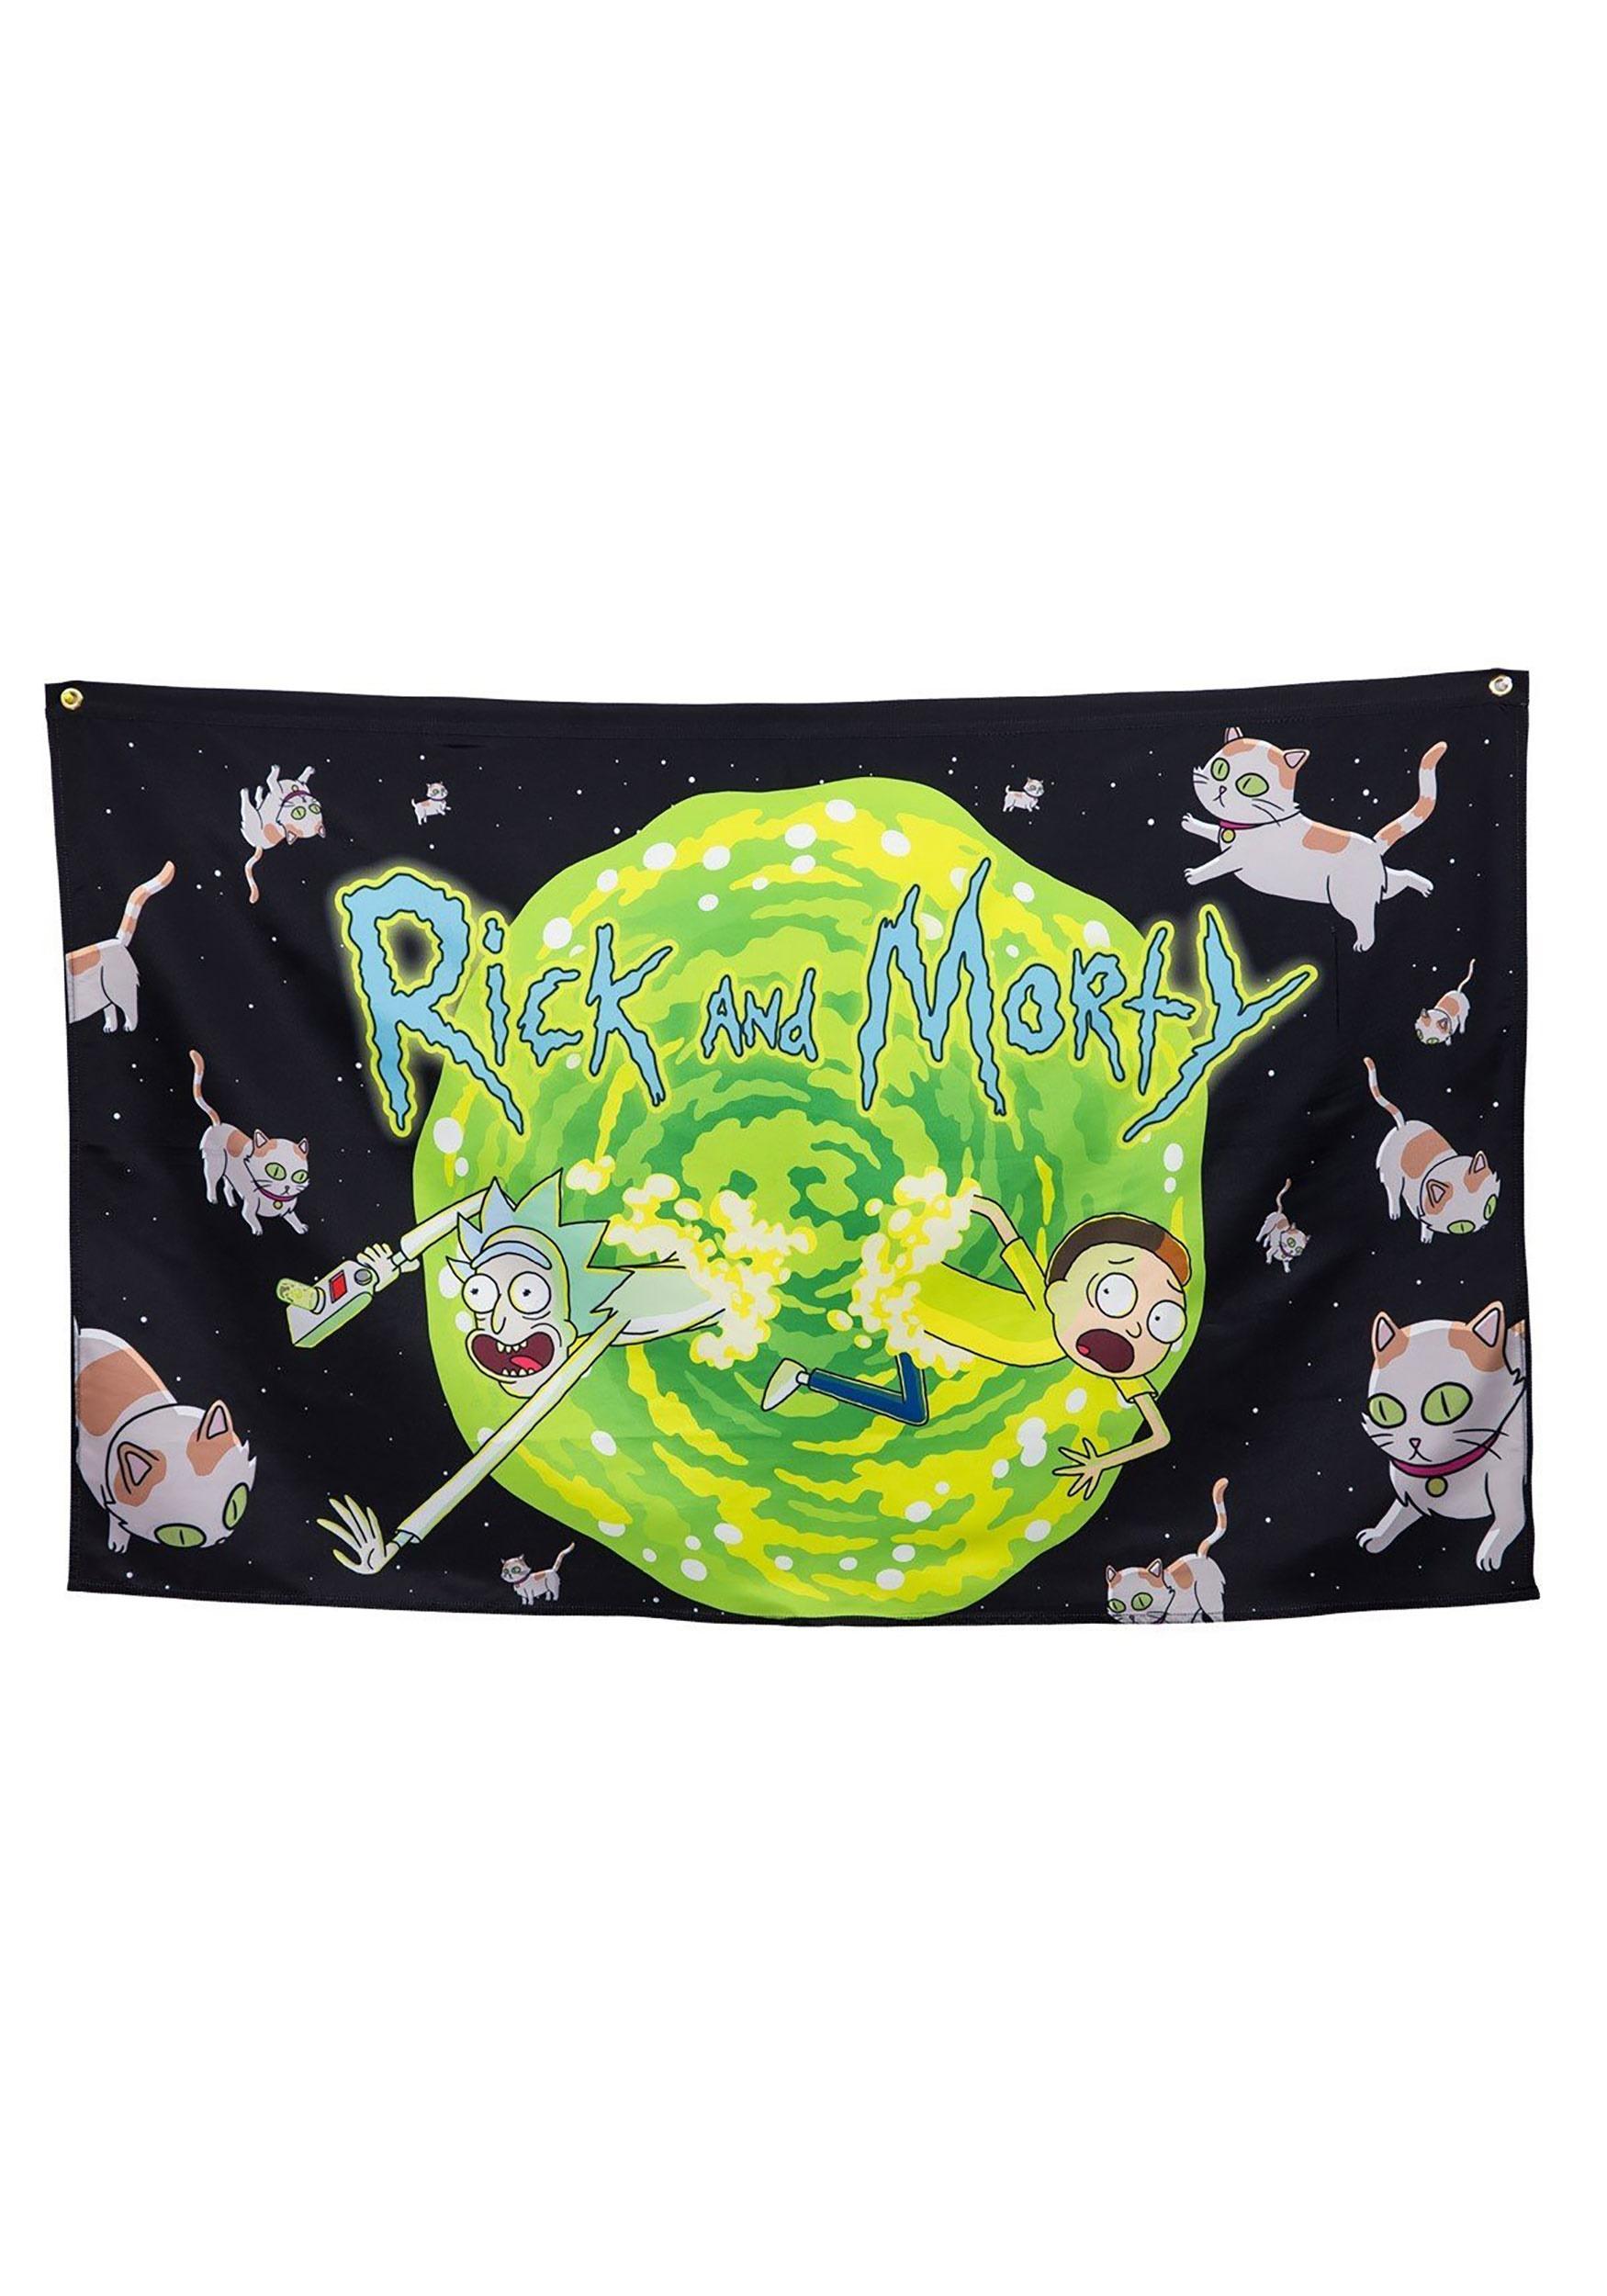 Rick and Morty Portal Banner